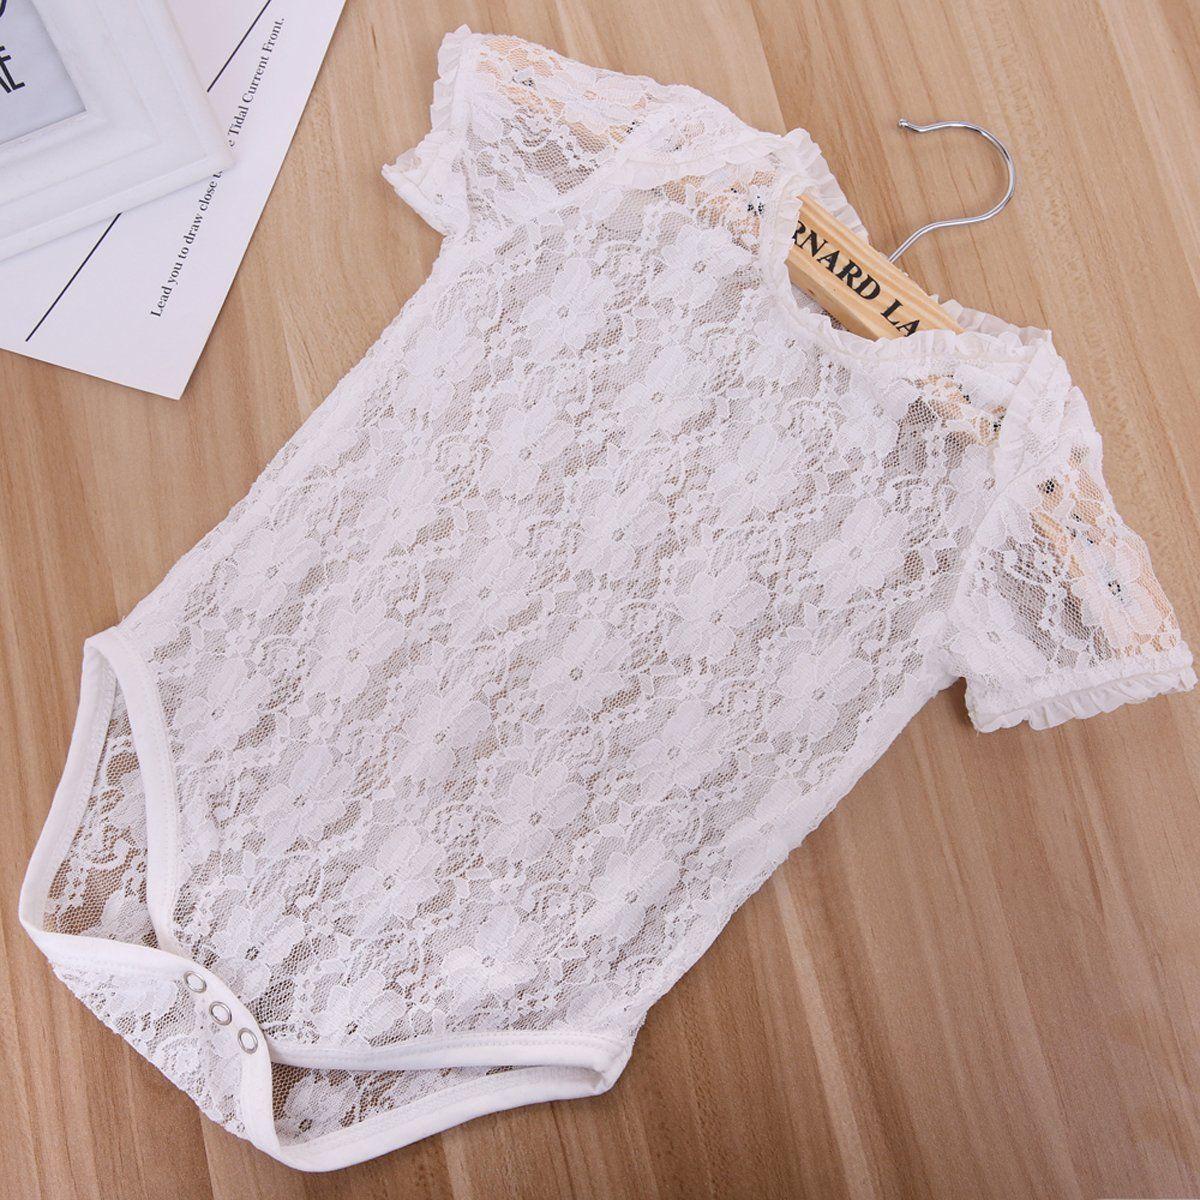 a7b955de9ded 2017 Toddler Infant Newborn Girls Sheer White Lace Floral Romper Jumpsuit  Playsuit One Piece Princess Clothes Sunsuit Outfits on Aliexpress.com